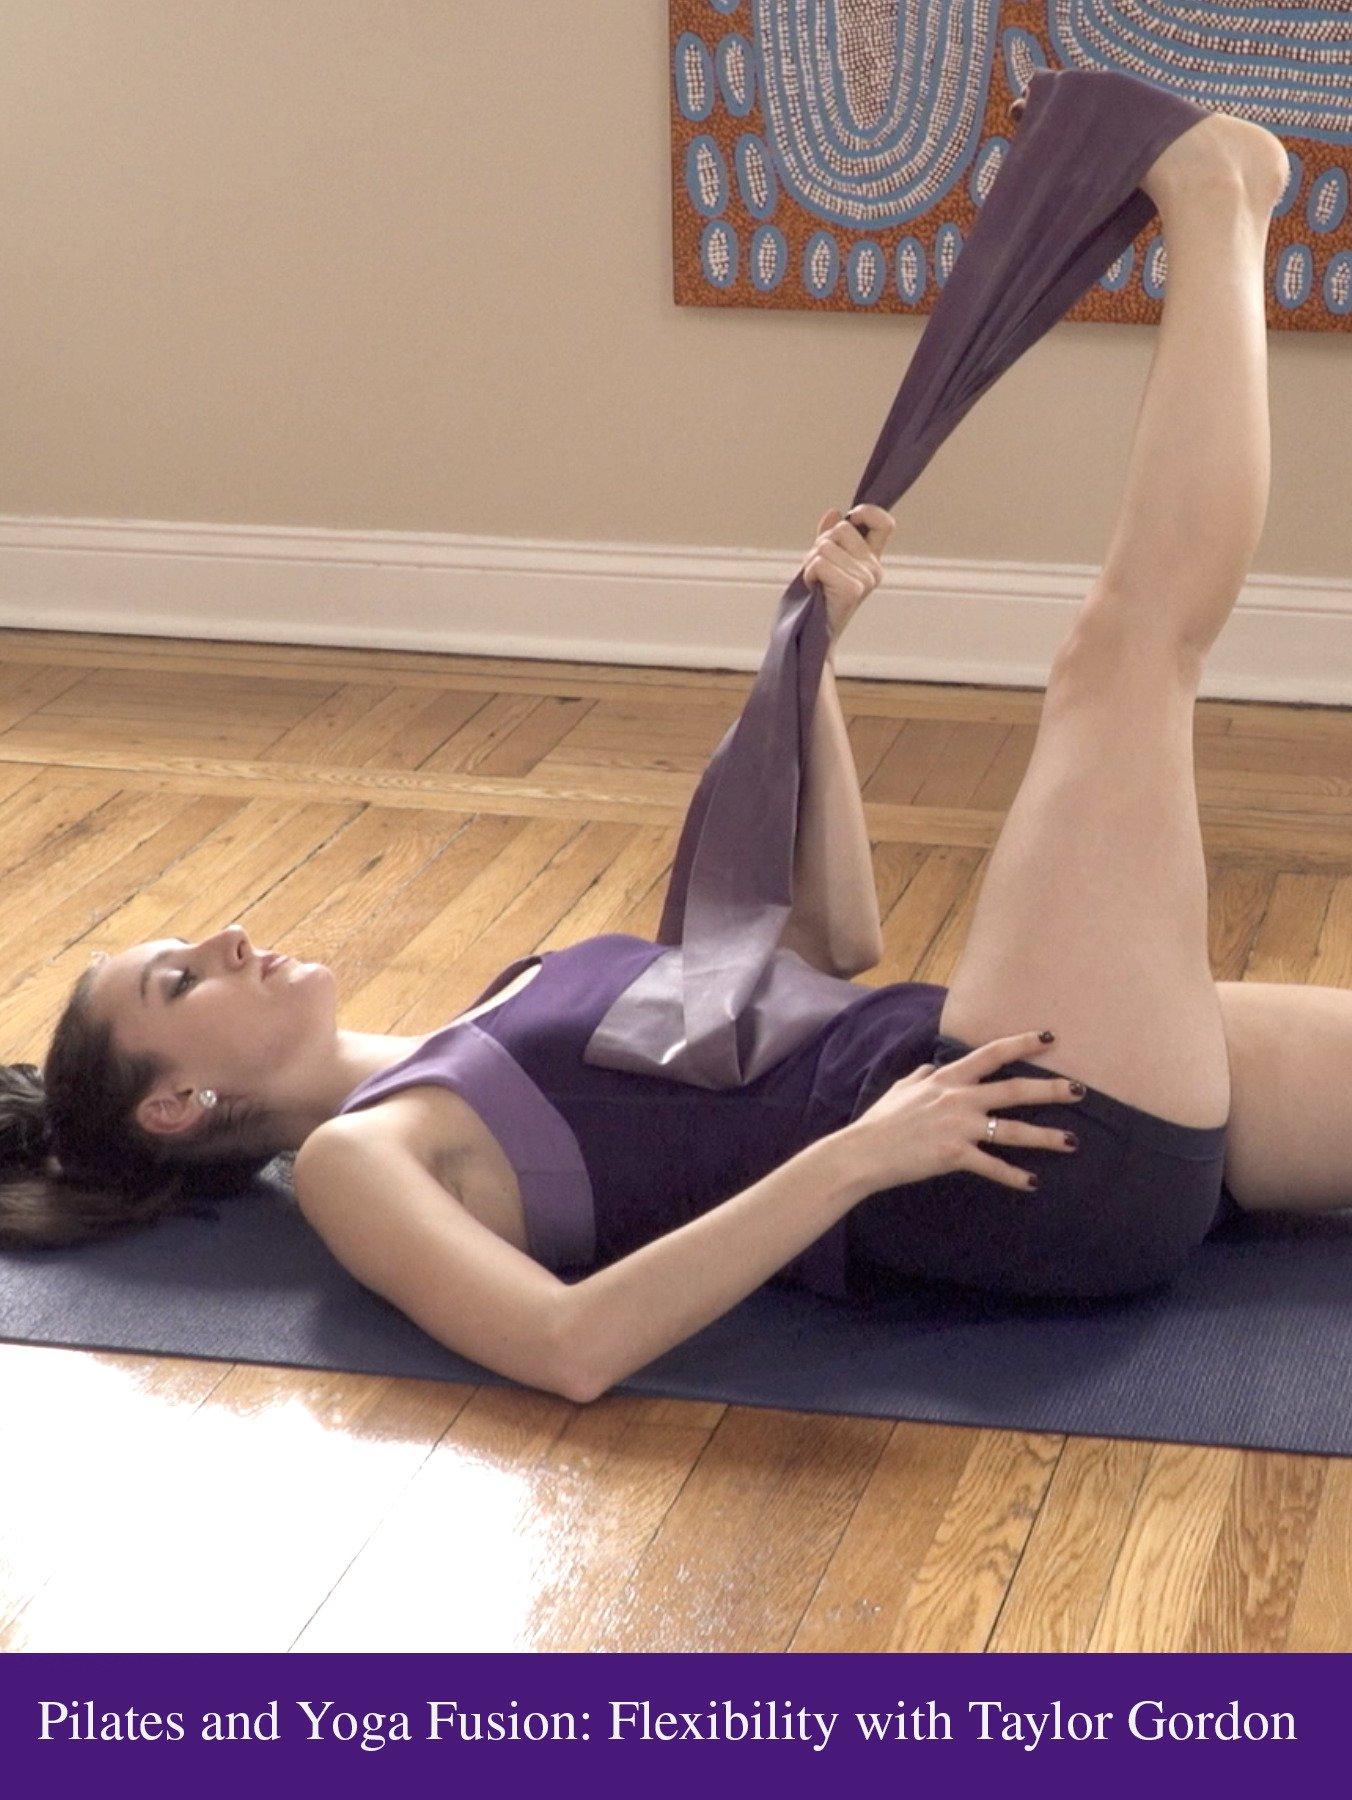 Pilates and Yoga Fusion: Flexibility with Taylor Gordon